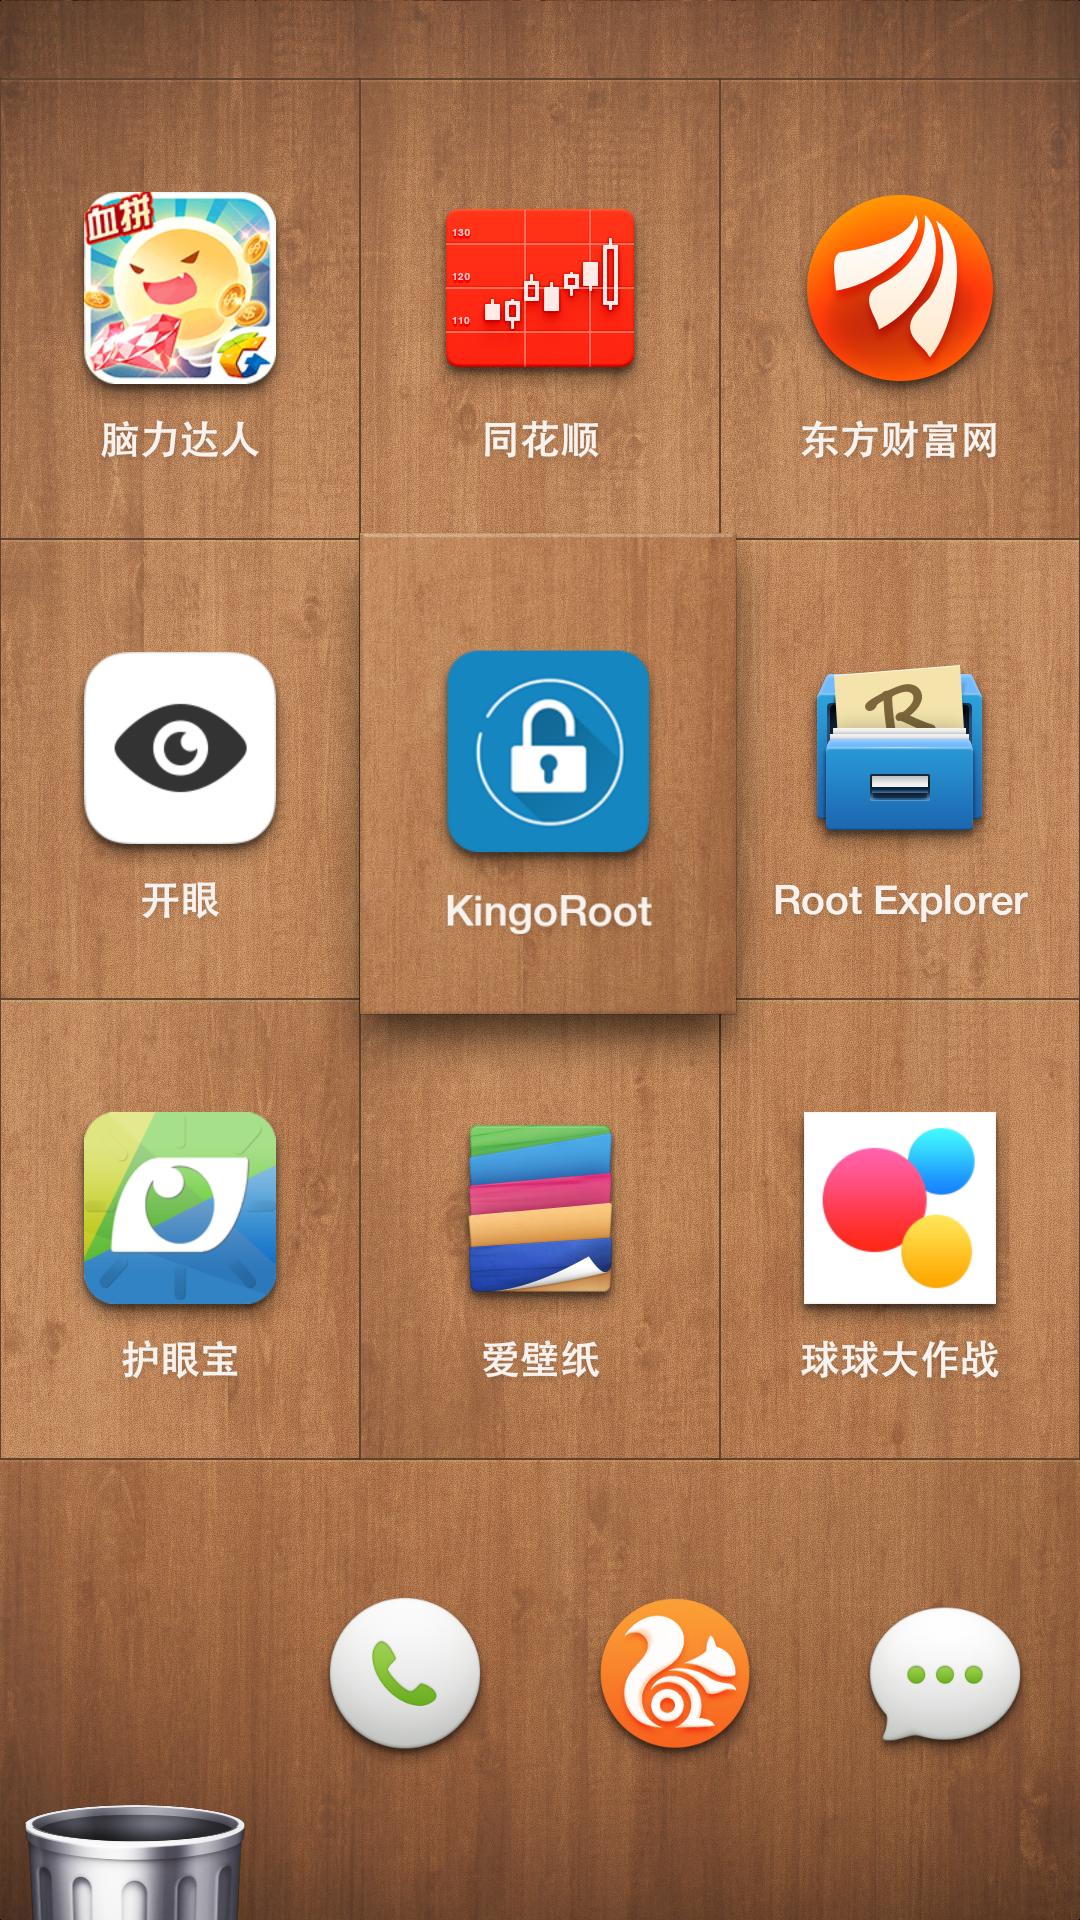 Screenshot_2015-07-09-09-19-27-959_桌面.png